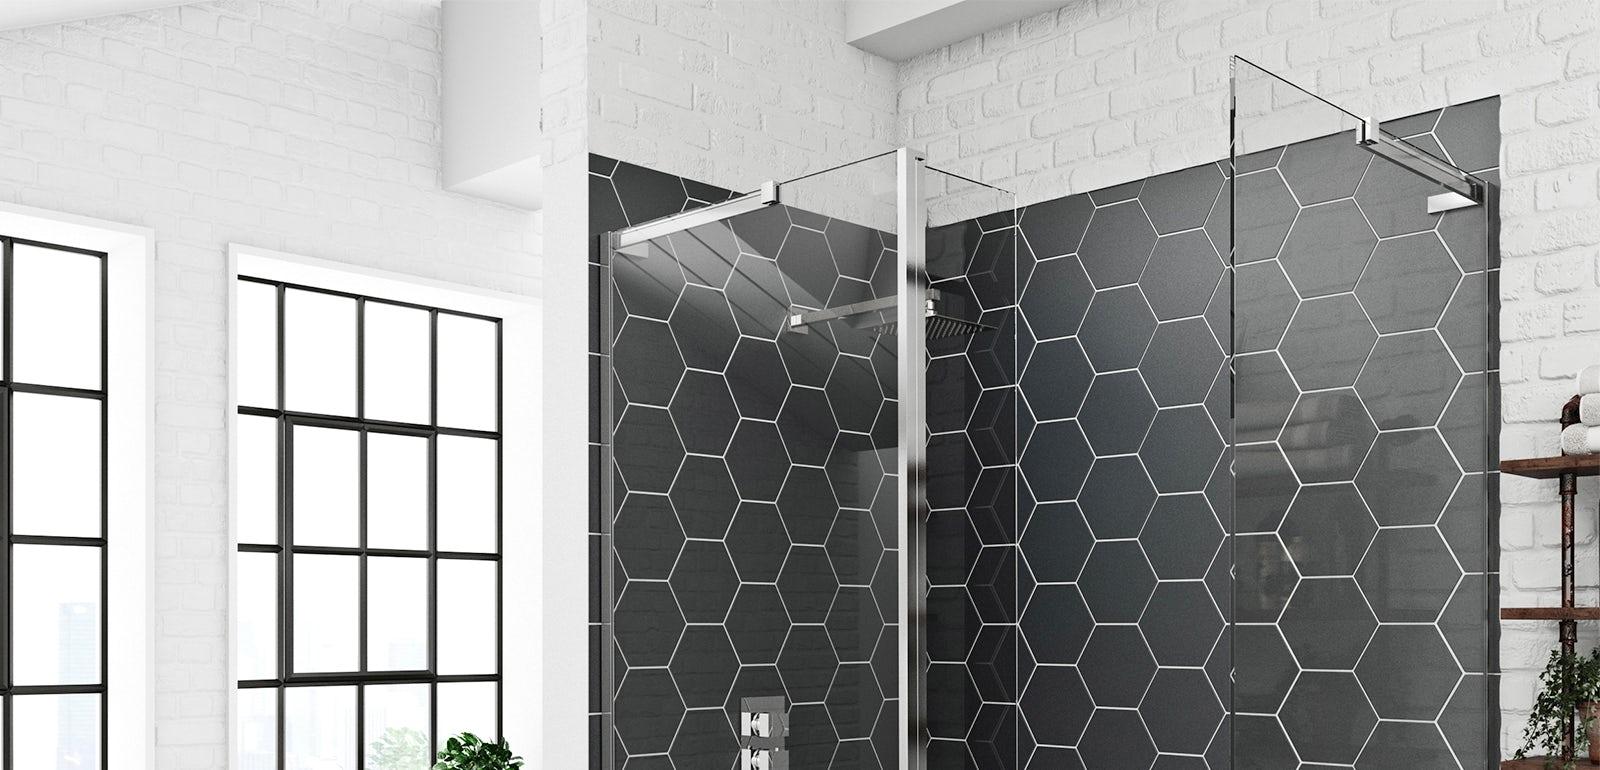 Wet room glass panels with black hexagonal tiles